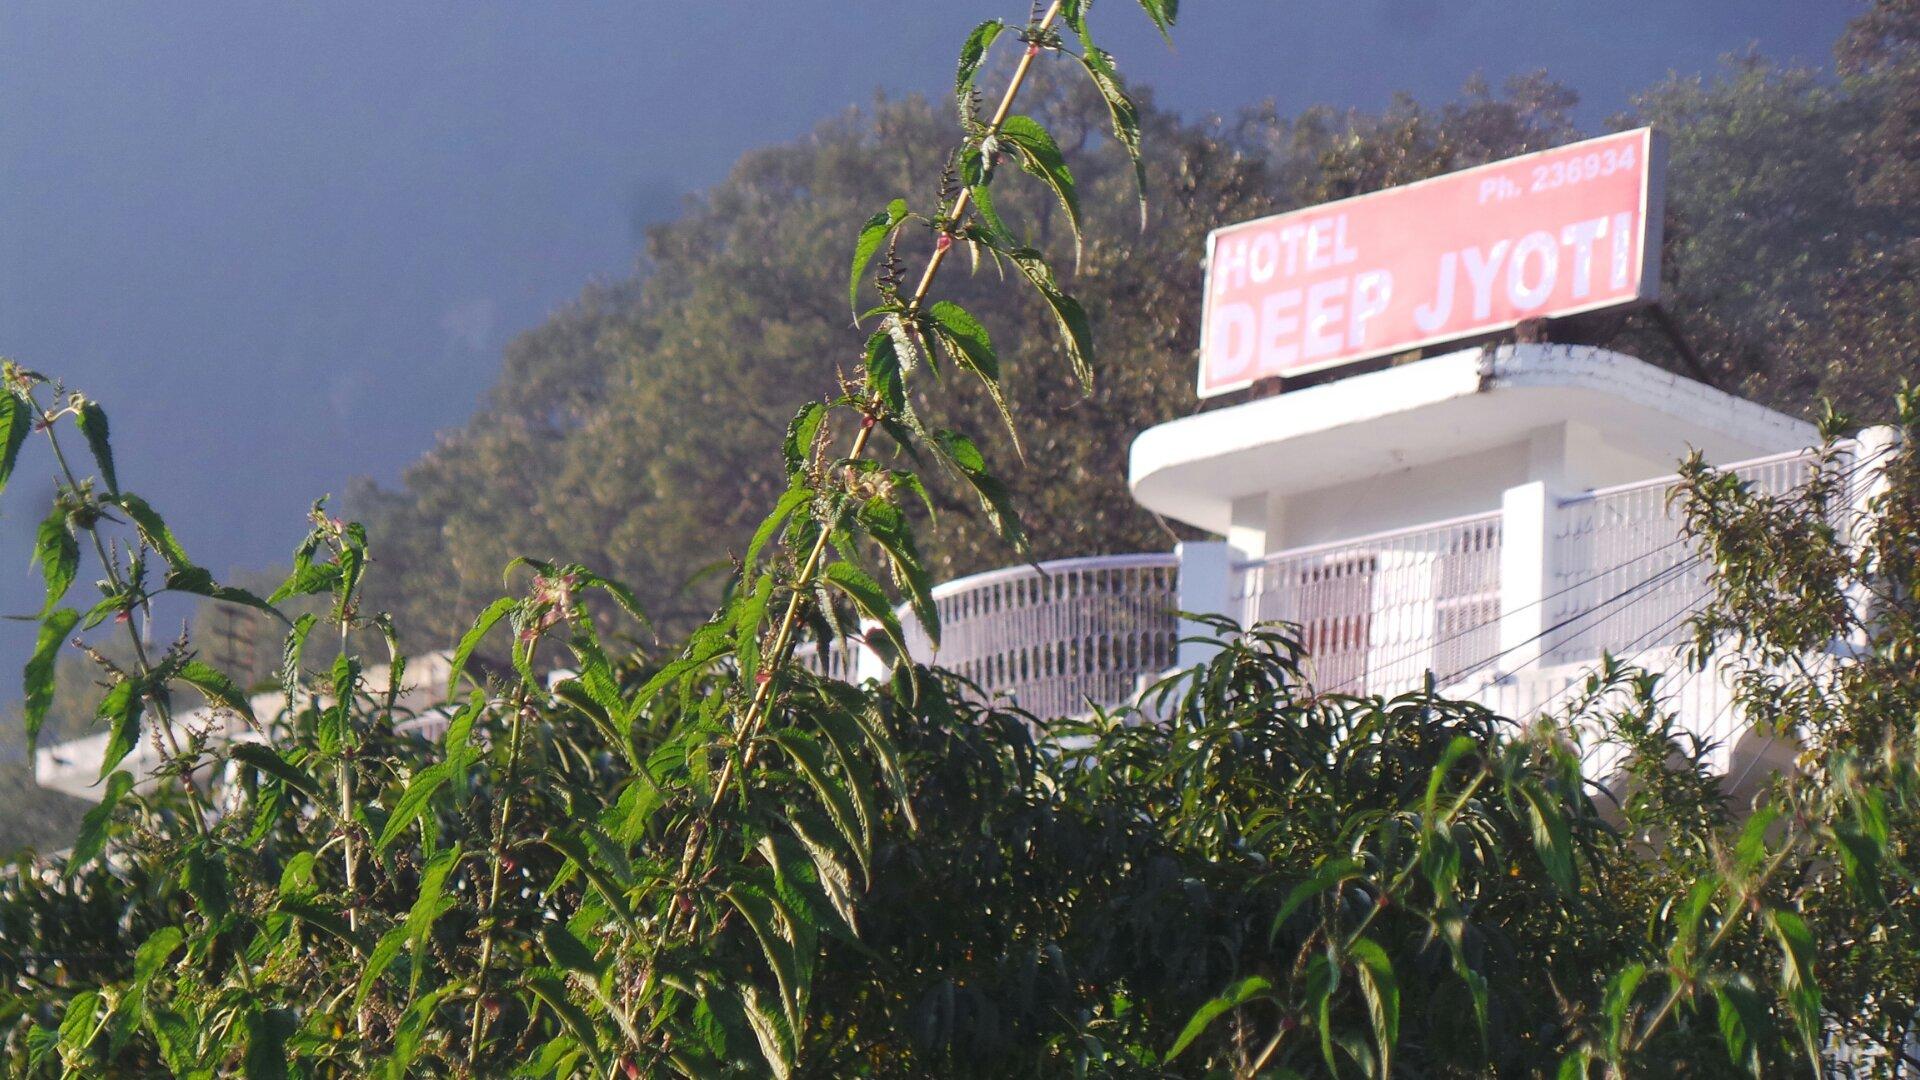 Hotel Deep Jyoti in Nainital